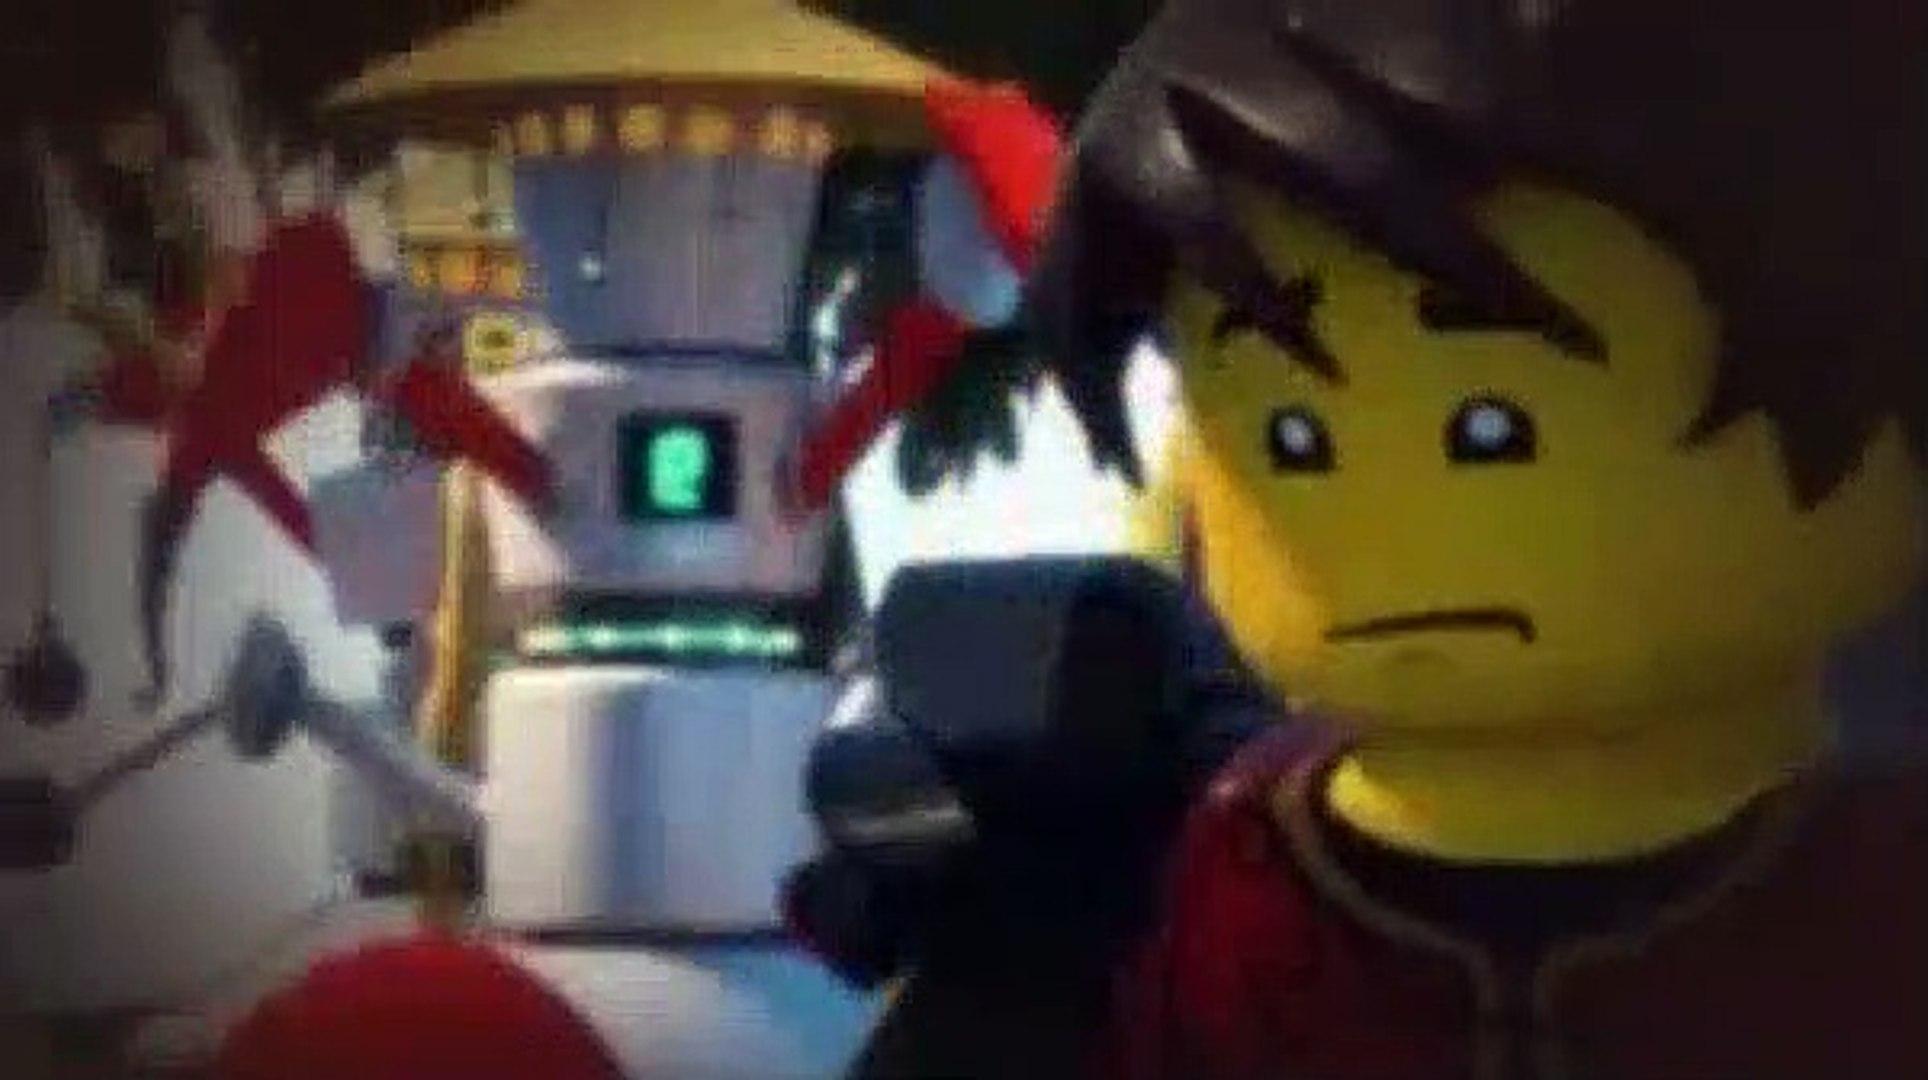 LEGO NinjaGo Masters Of Spinjitzu Season 7 Episode 4 Scavengers - video  Dailymotion